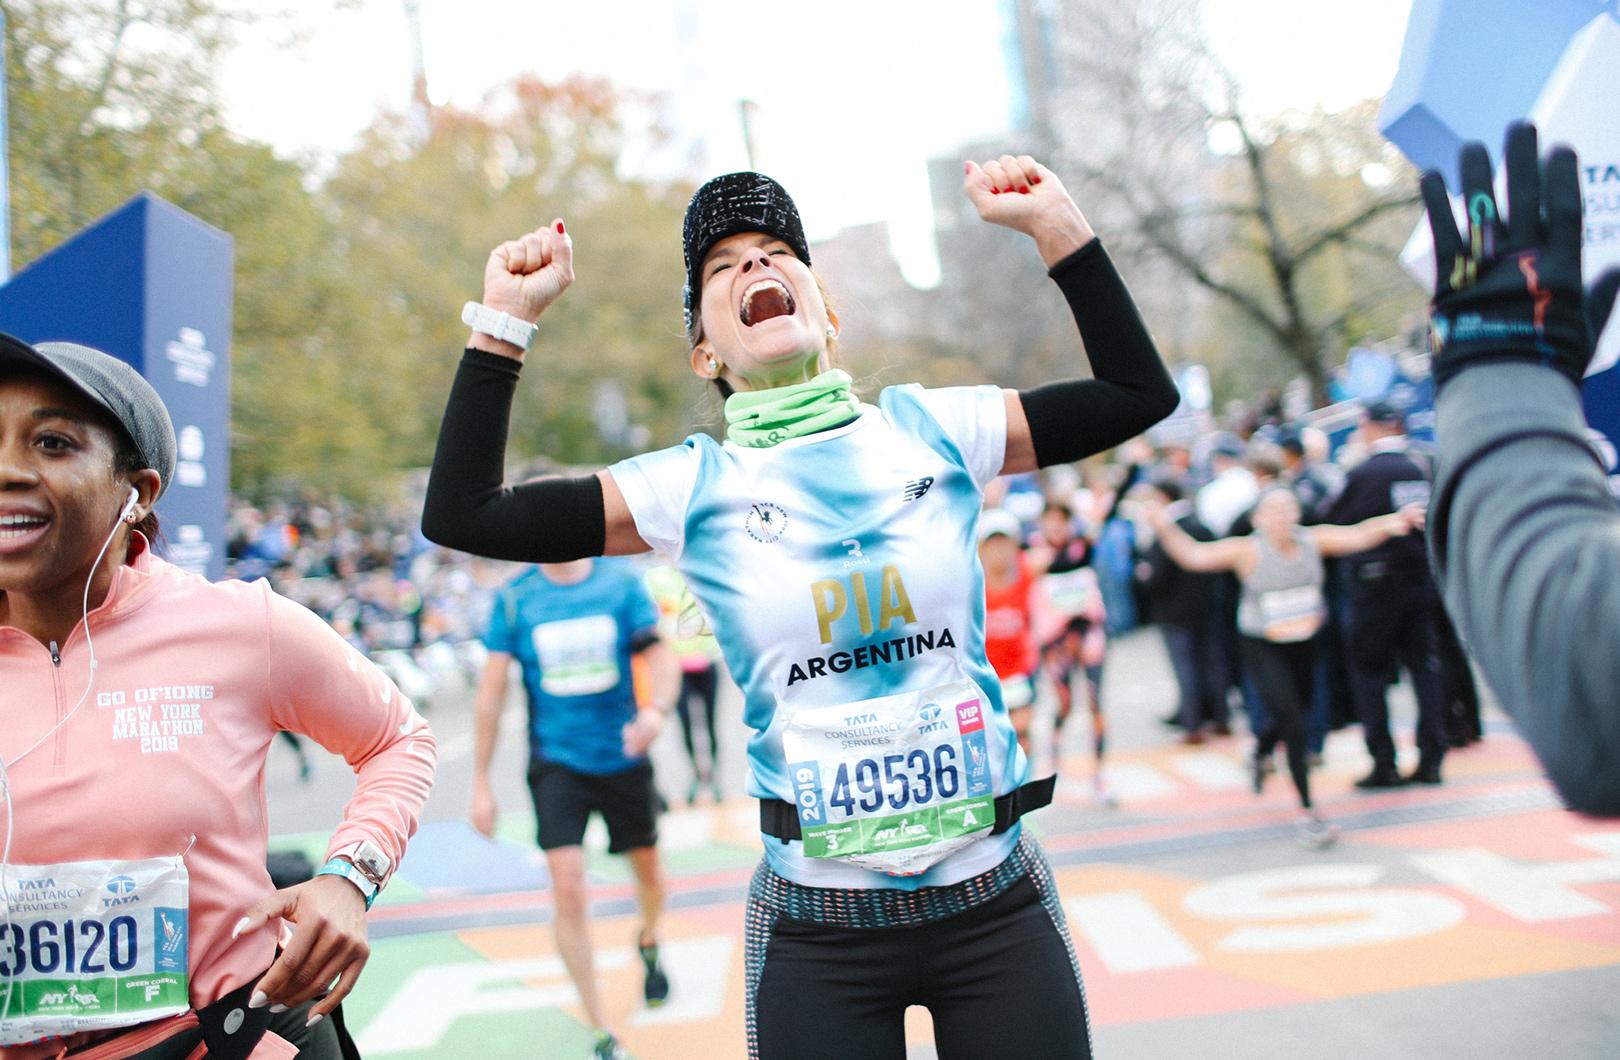 2019 TCS New York City Marathon finisher from Argentina